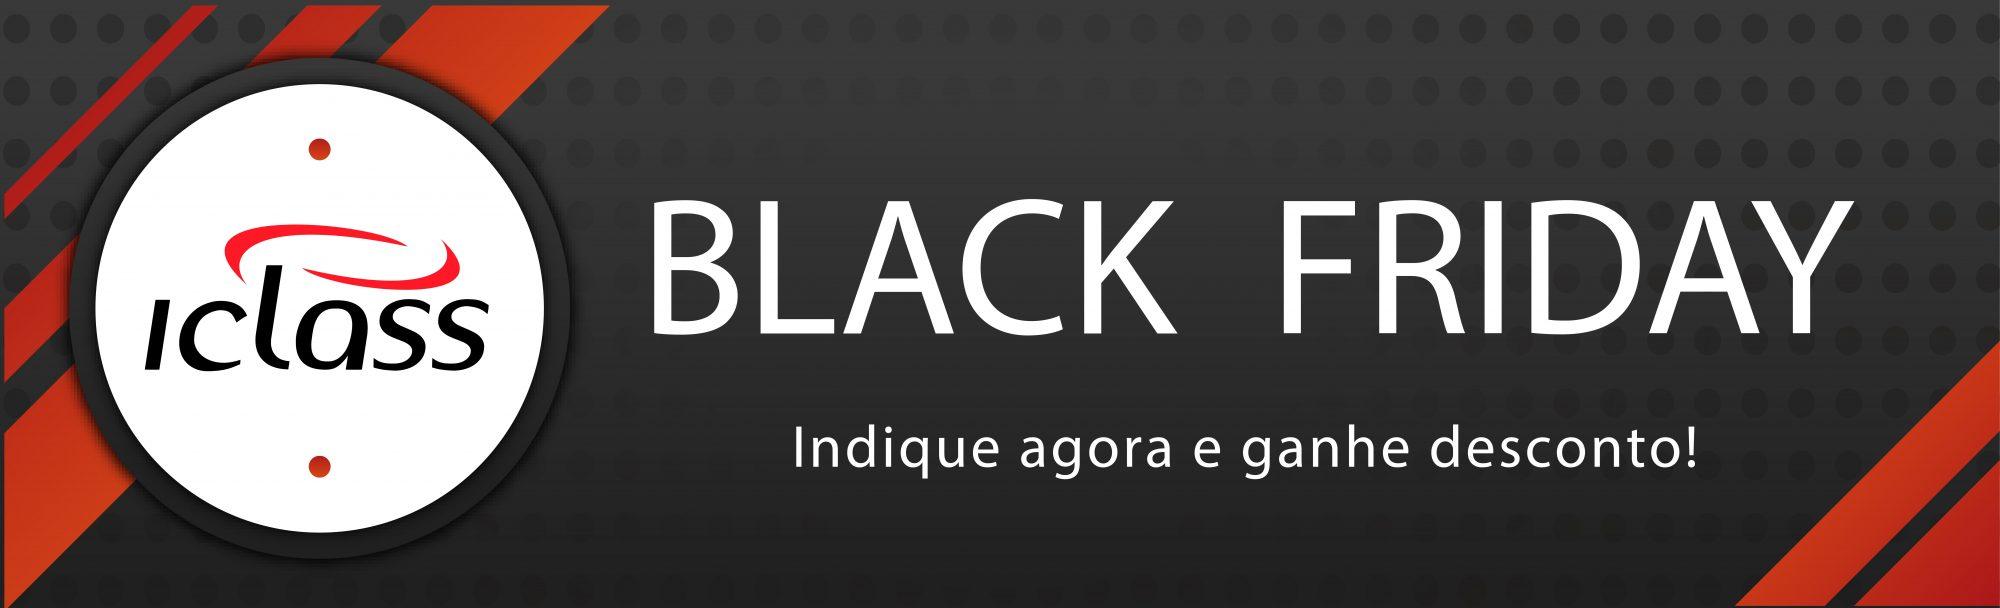 Black Friday 2018 ICLASS Black Friday 2018 ICLASS